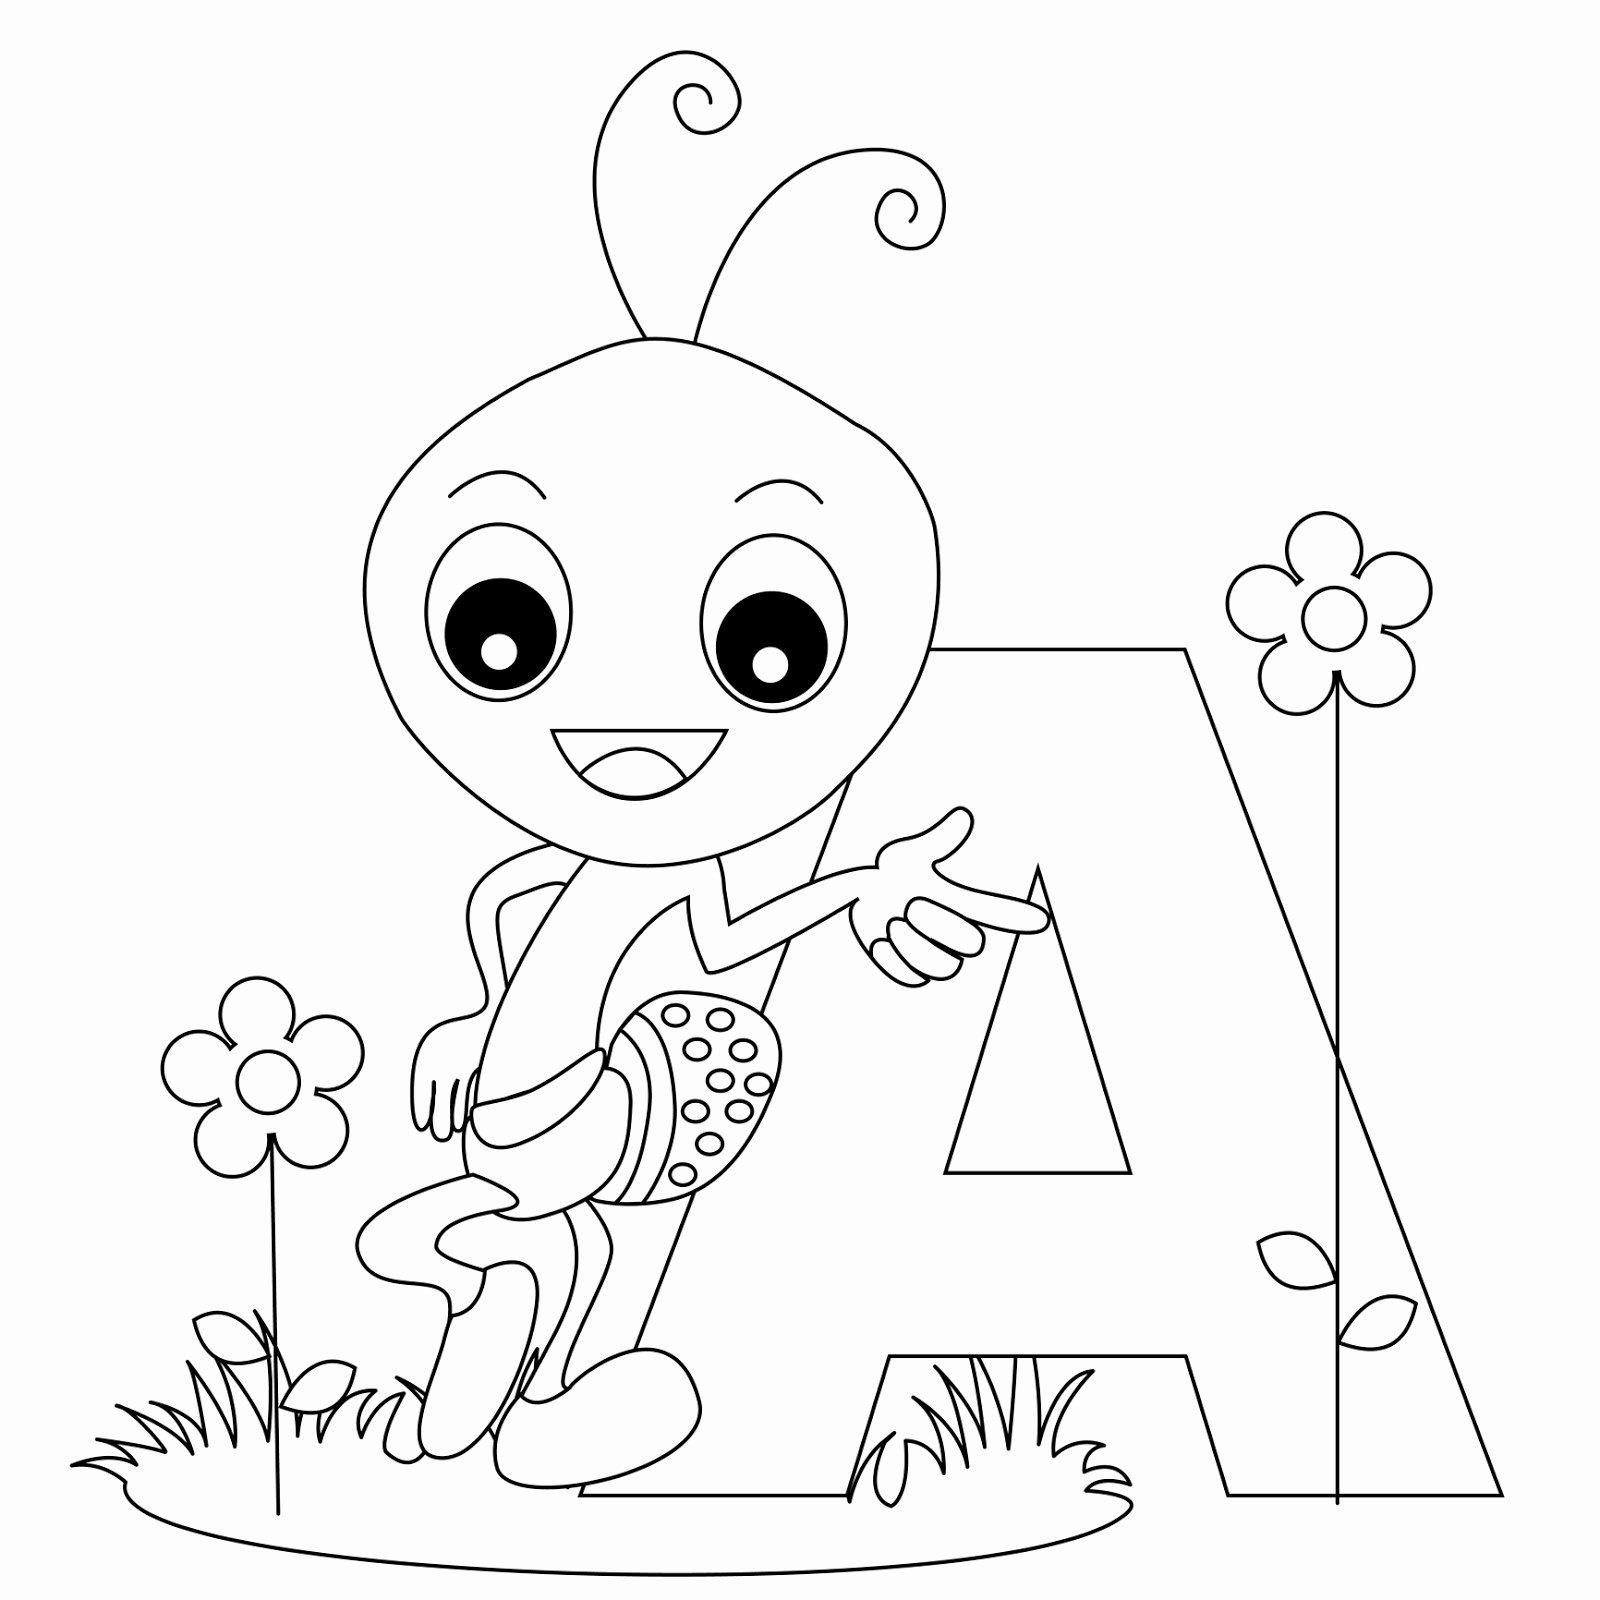 Letter A Coloring Sheets Elegant Animal Alphabet Letter A Coloring Child Coloring Buku Mewarnai Halaman Mewarnai Alfabet Huruf